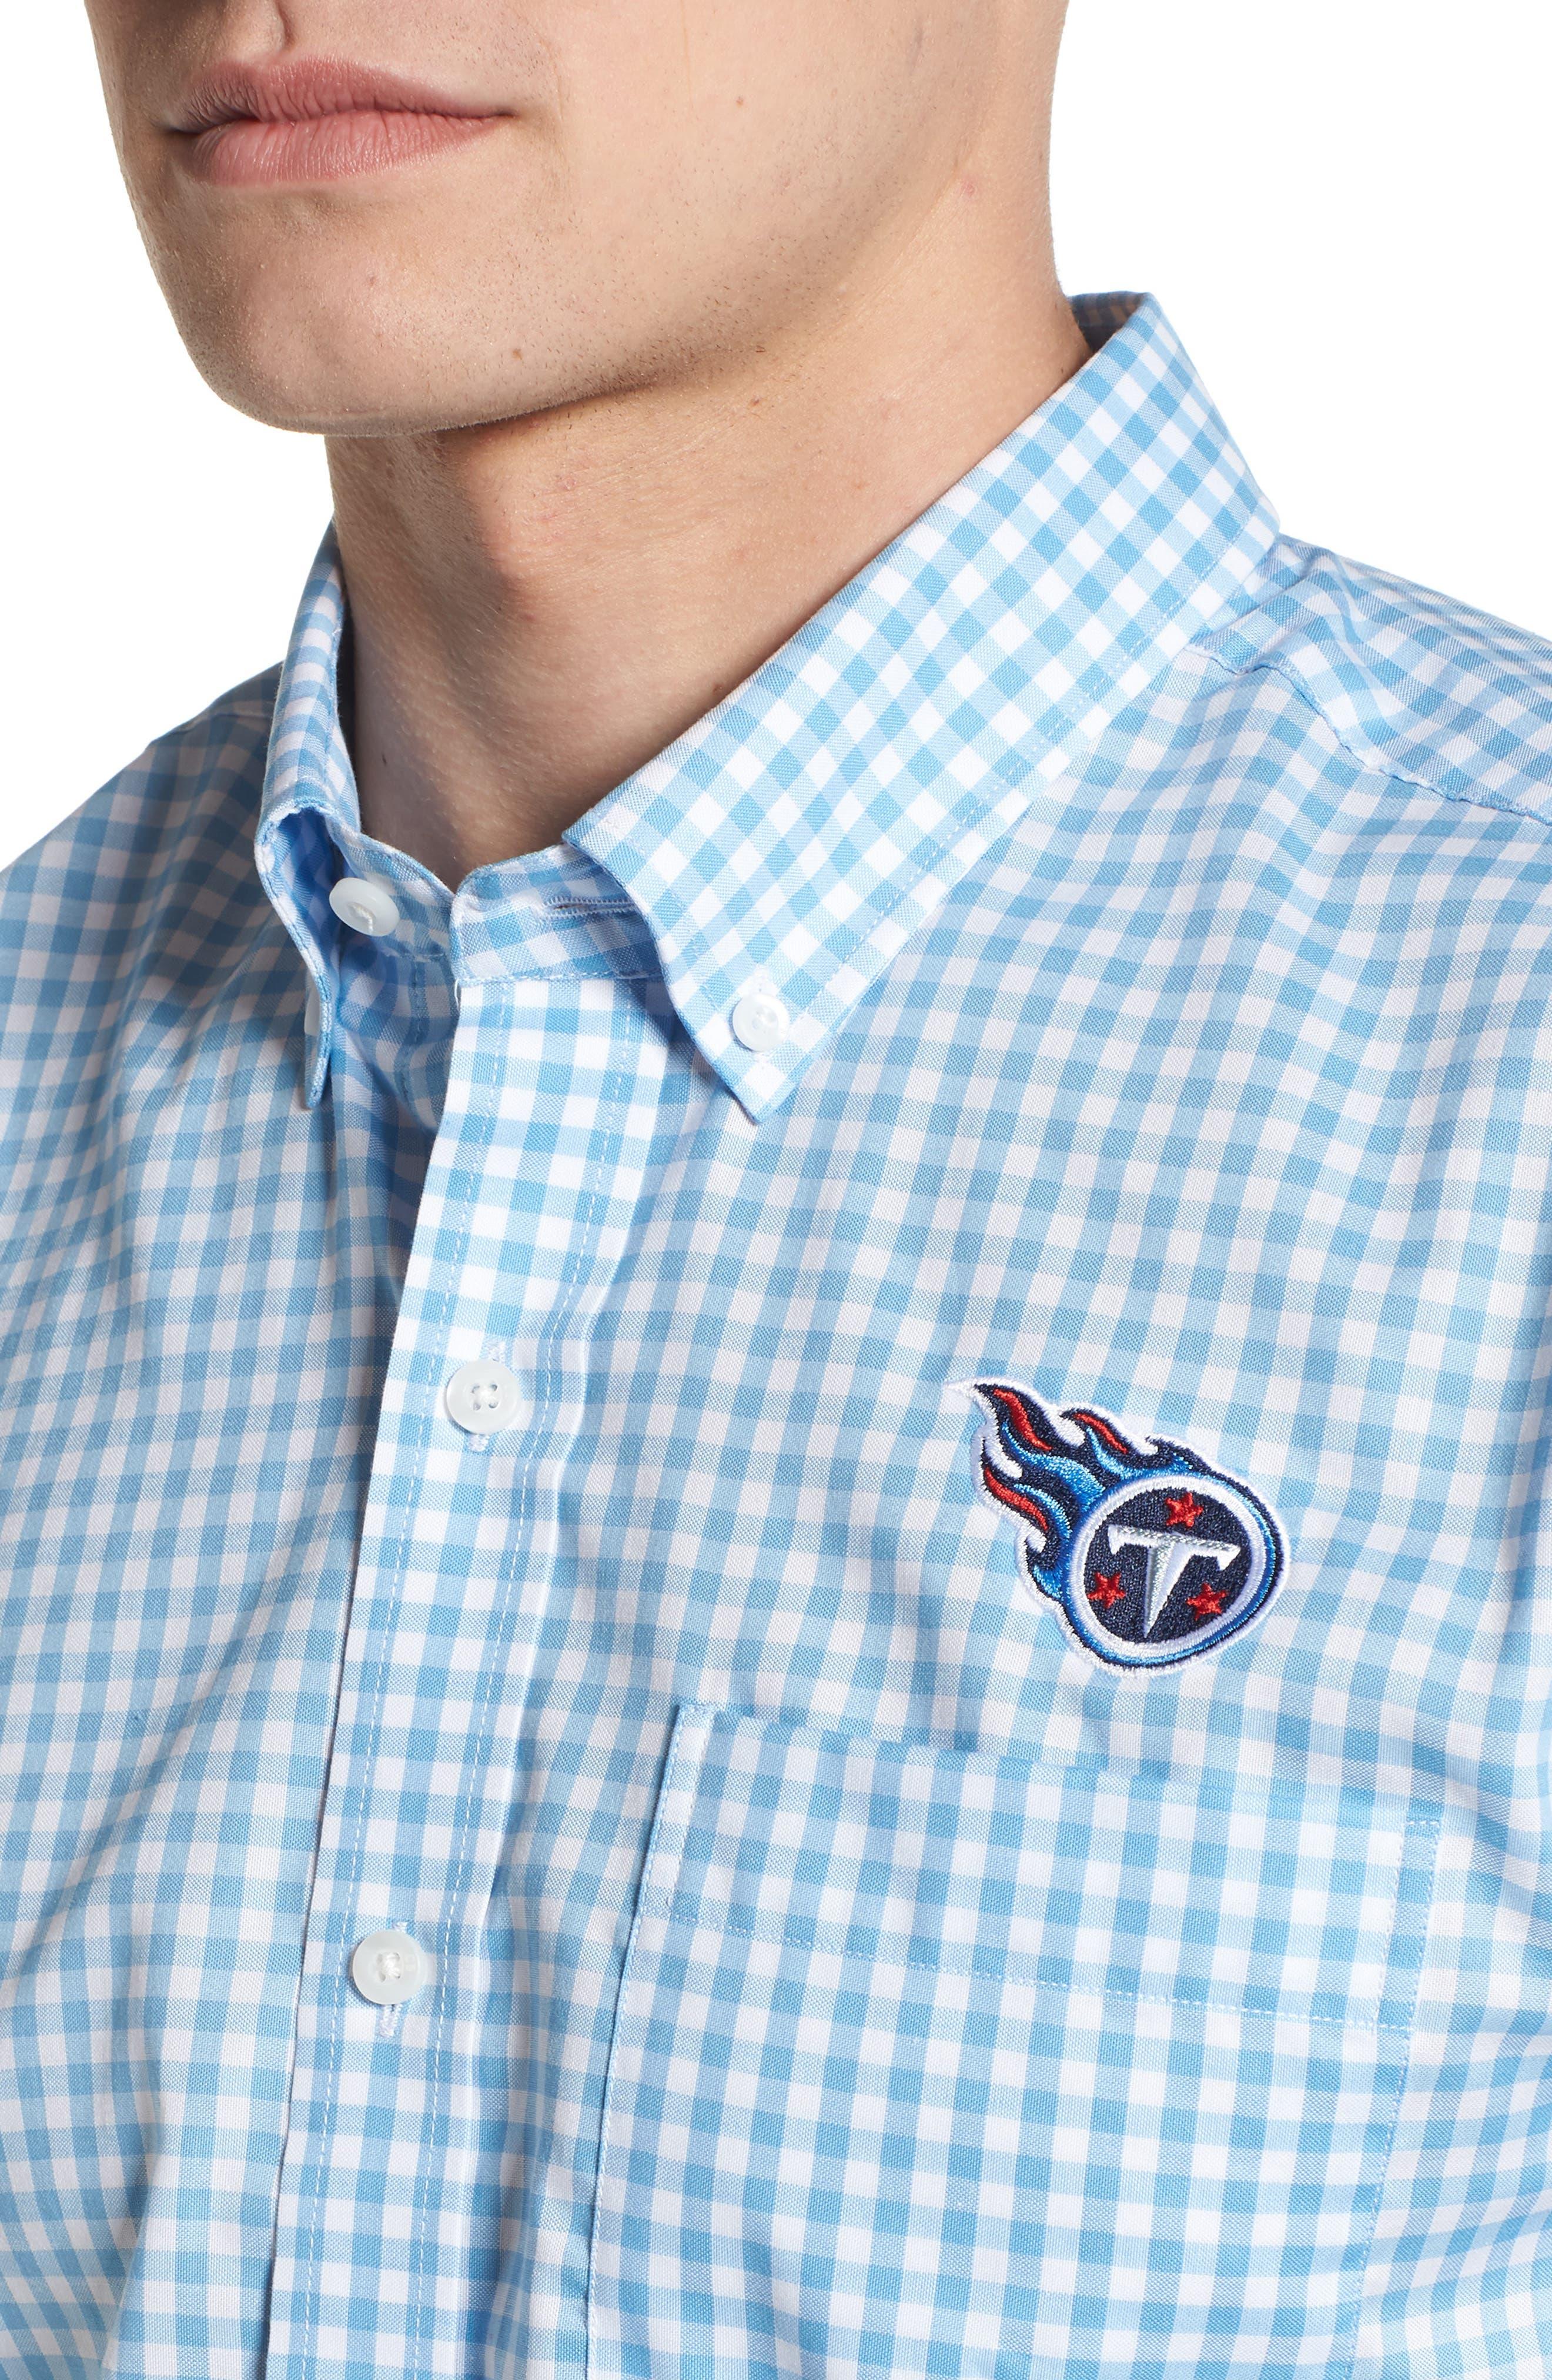 Tennessee Titans - League Regular Fit Sport Shirt,                             Alternate thumbnail 4, color,                             ATLAS